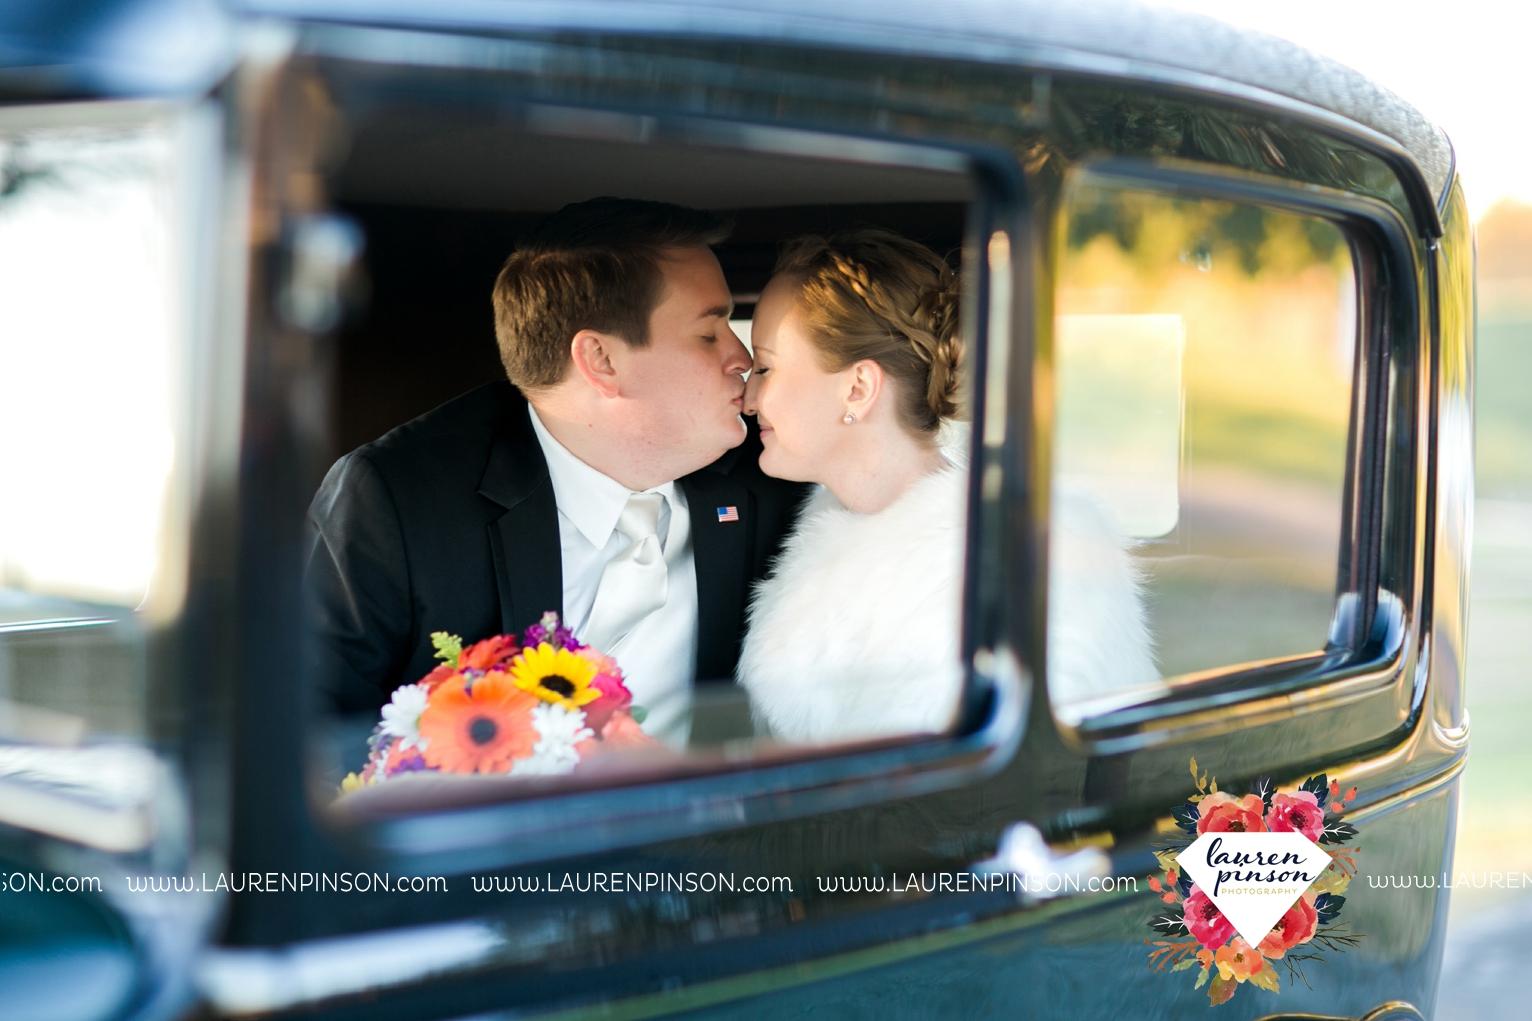 bells-texas-wedding-photography-at-willowood-ranch-chapel-north-texas-wichita-falls-wedding-photographer_1859.jpg